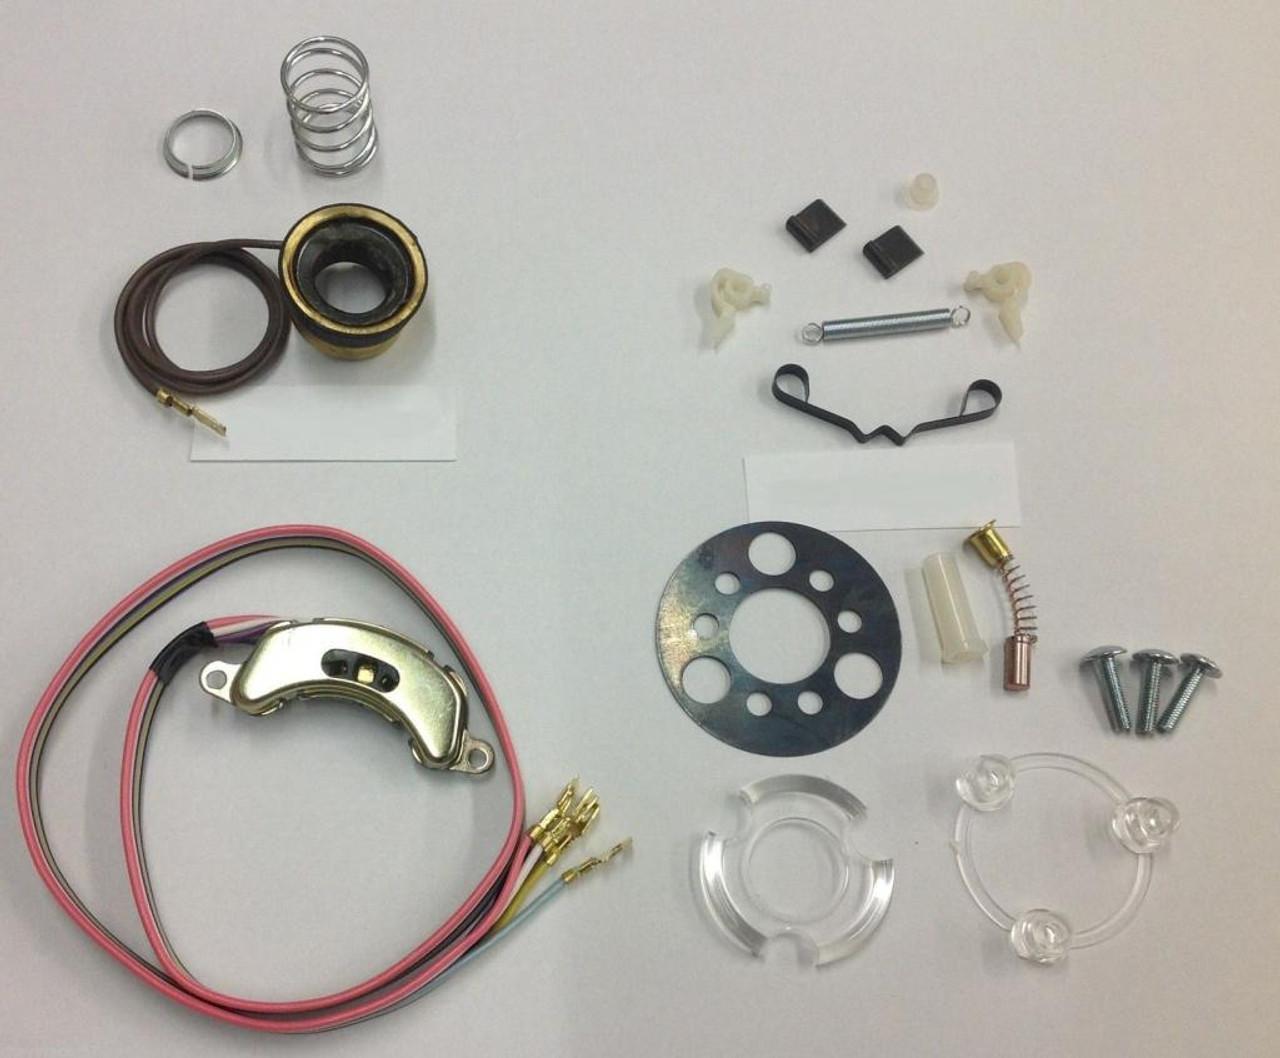 55 1955 Chevy Car Steering Column Turn Signal & Horn Rebuild Kit New